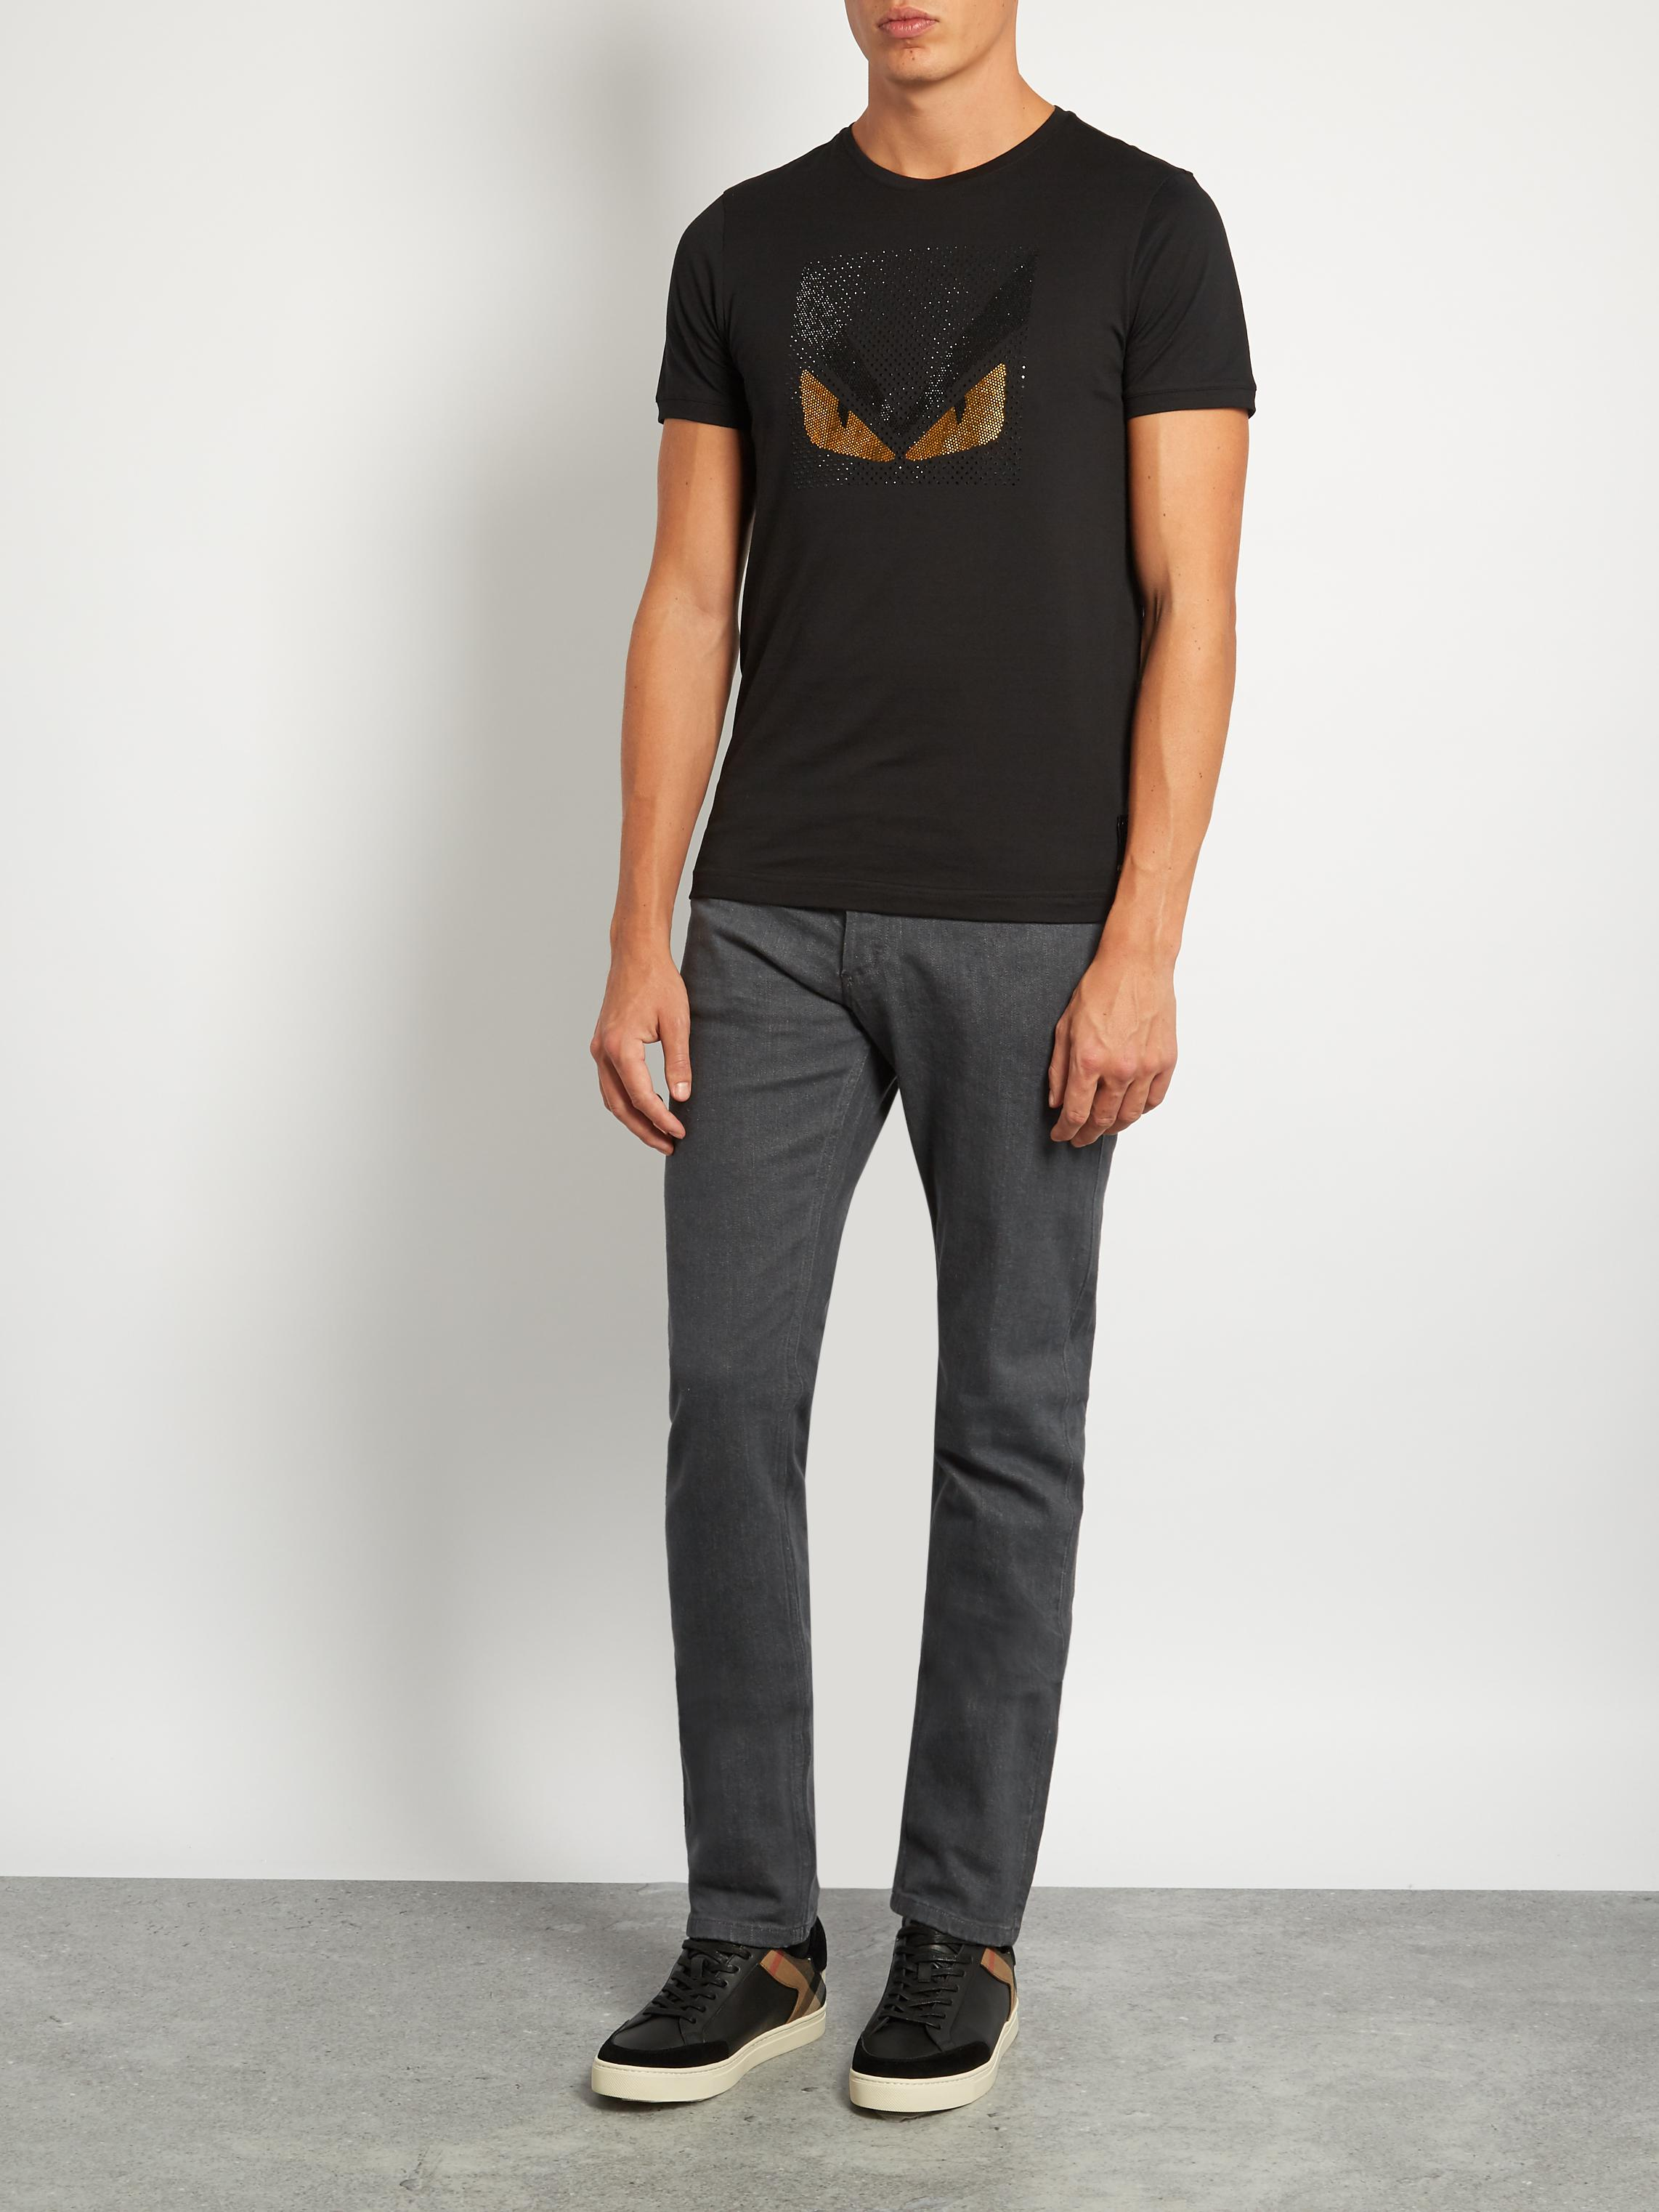 75351f05dc48 Lyst - Fendi Bag Bugs-embellished Cotton-jersey T-shirt in Black for Men